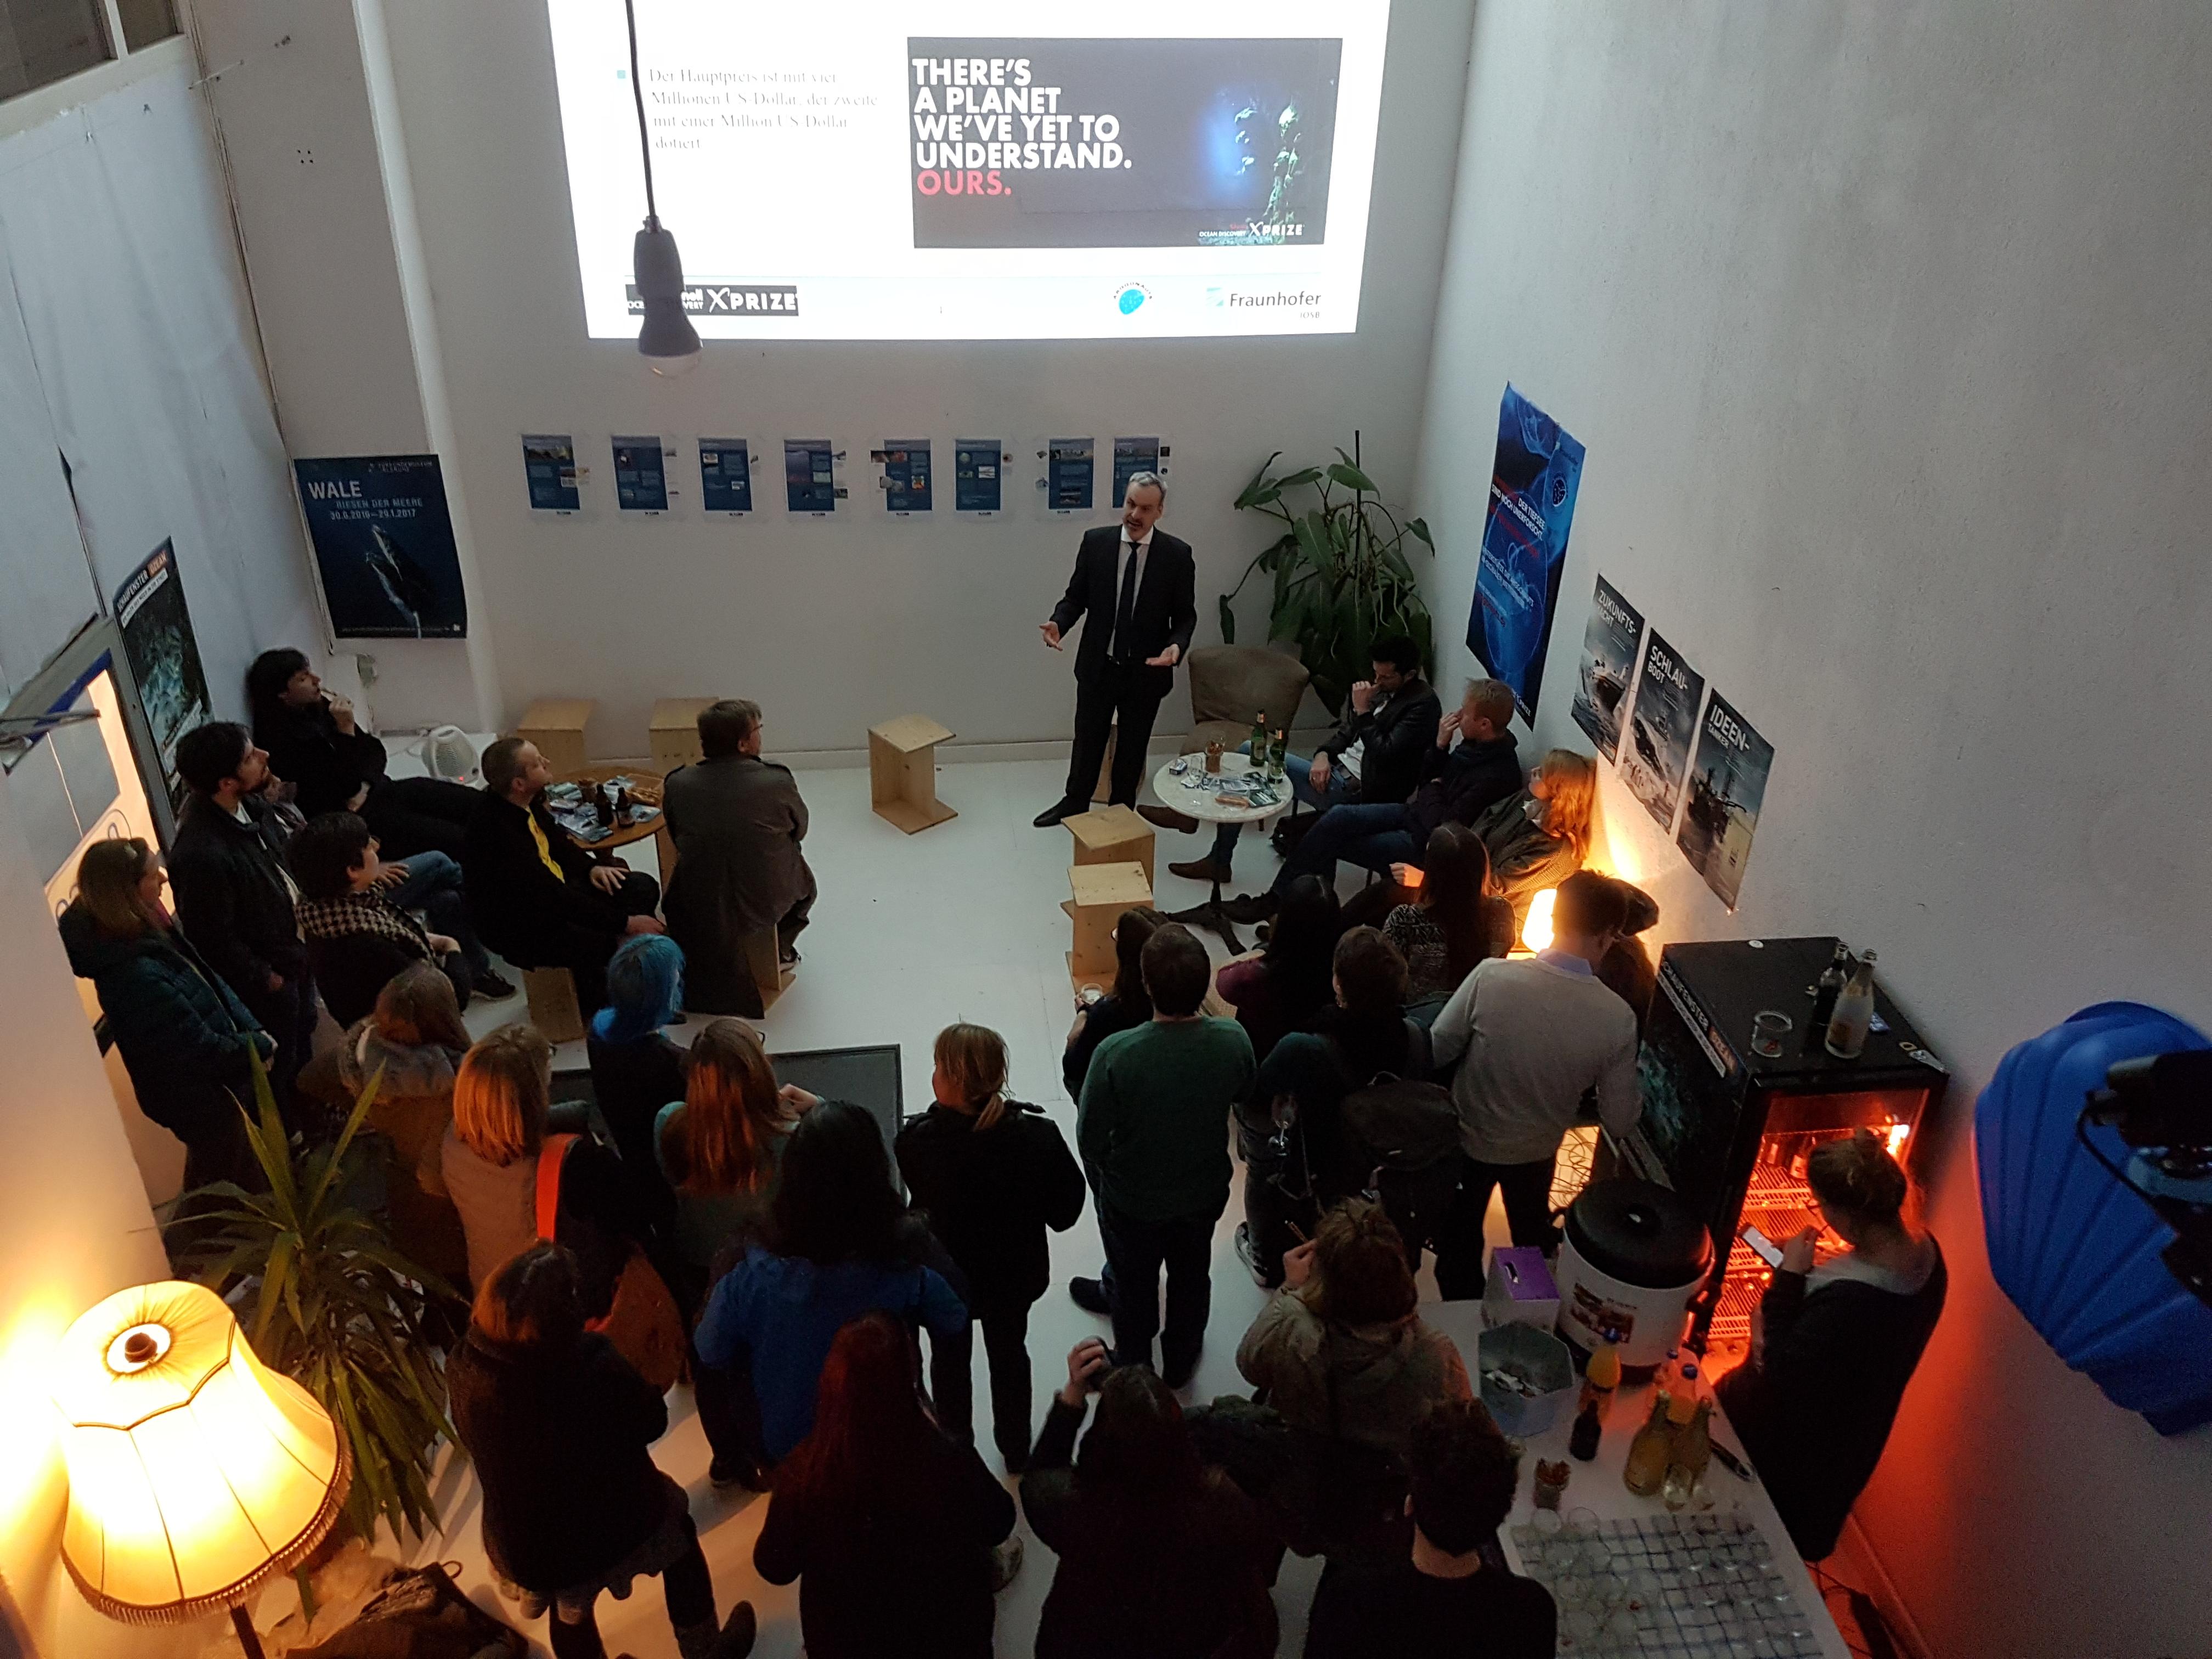 Vortrag vor Publikum im ßpace 1